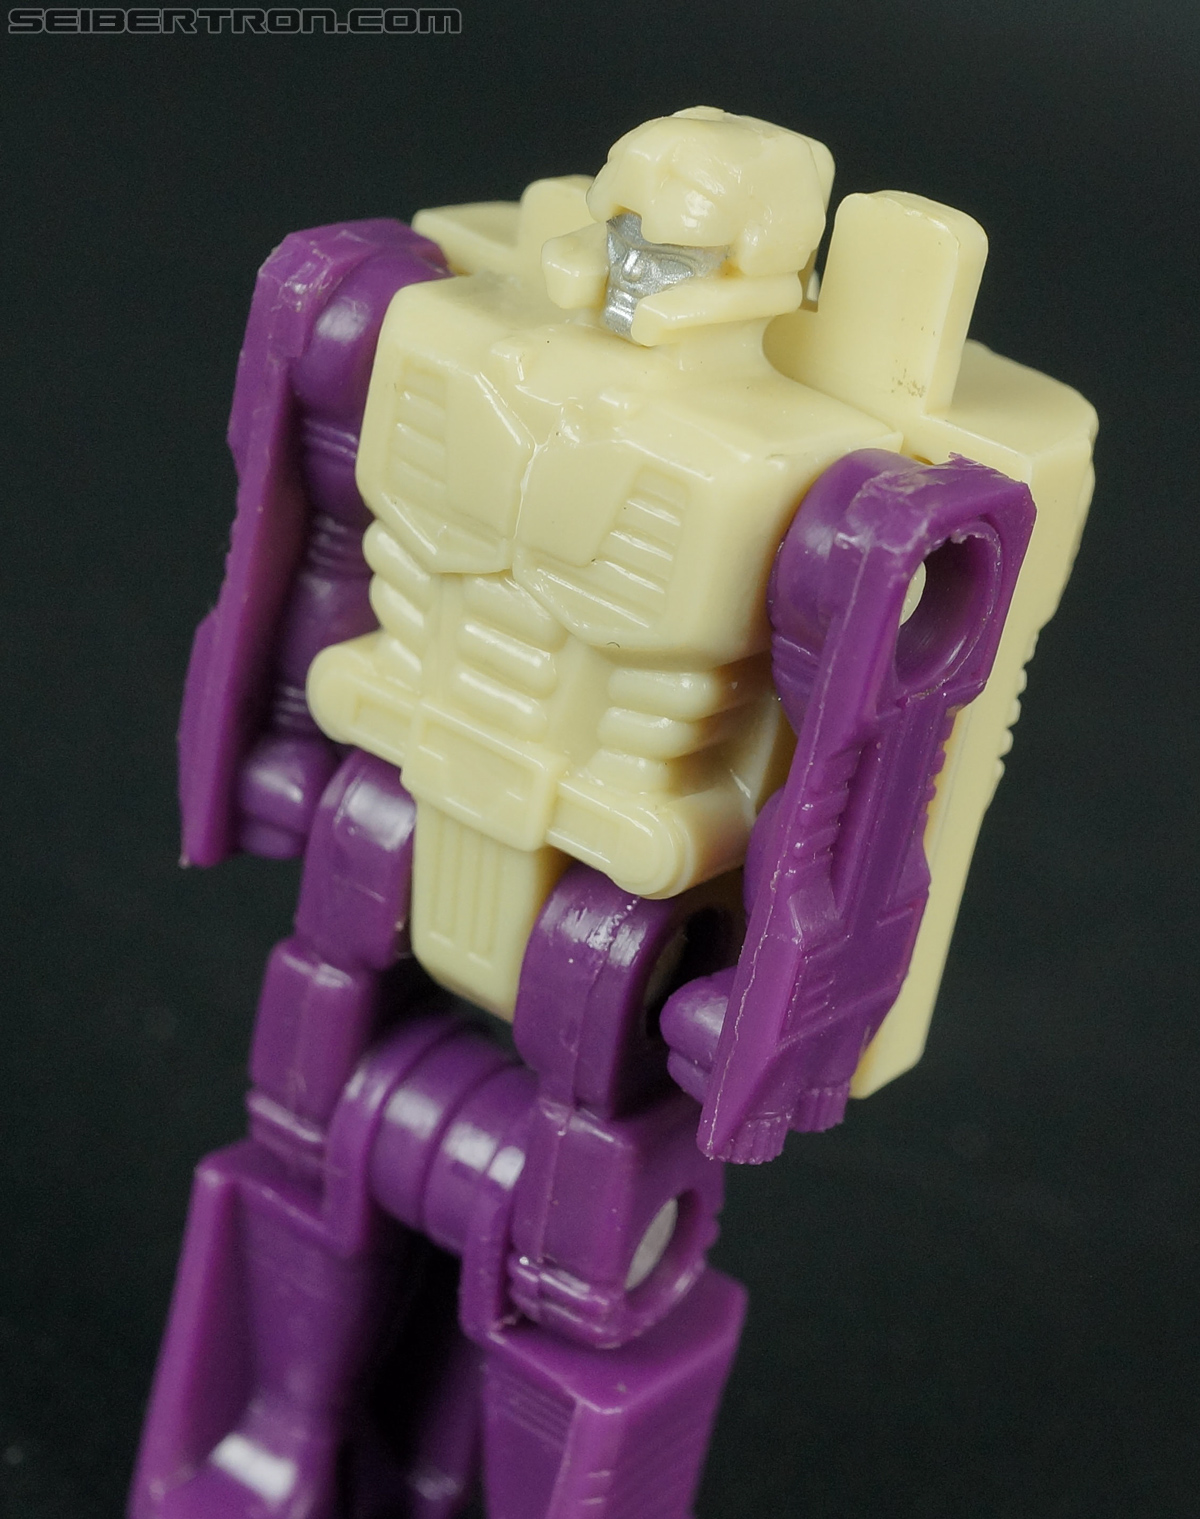 Transformers G1 1987 Lord Zarak (Scorponok) (Image #53 of 116)